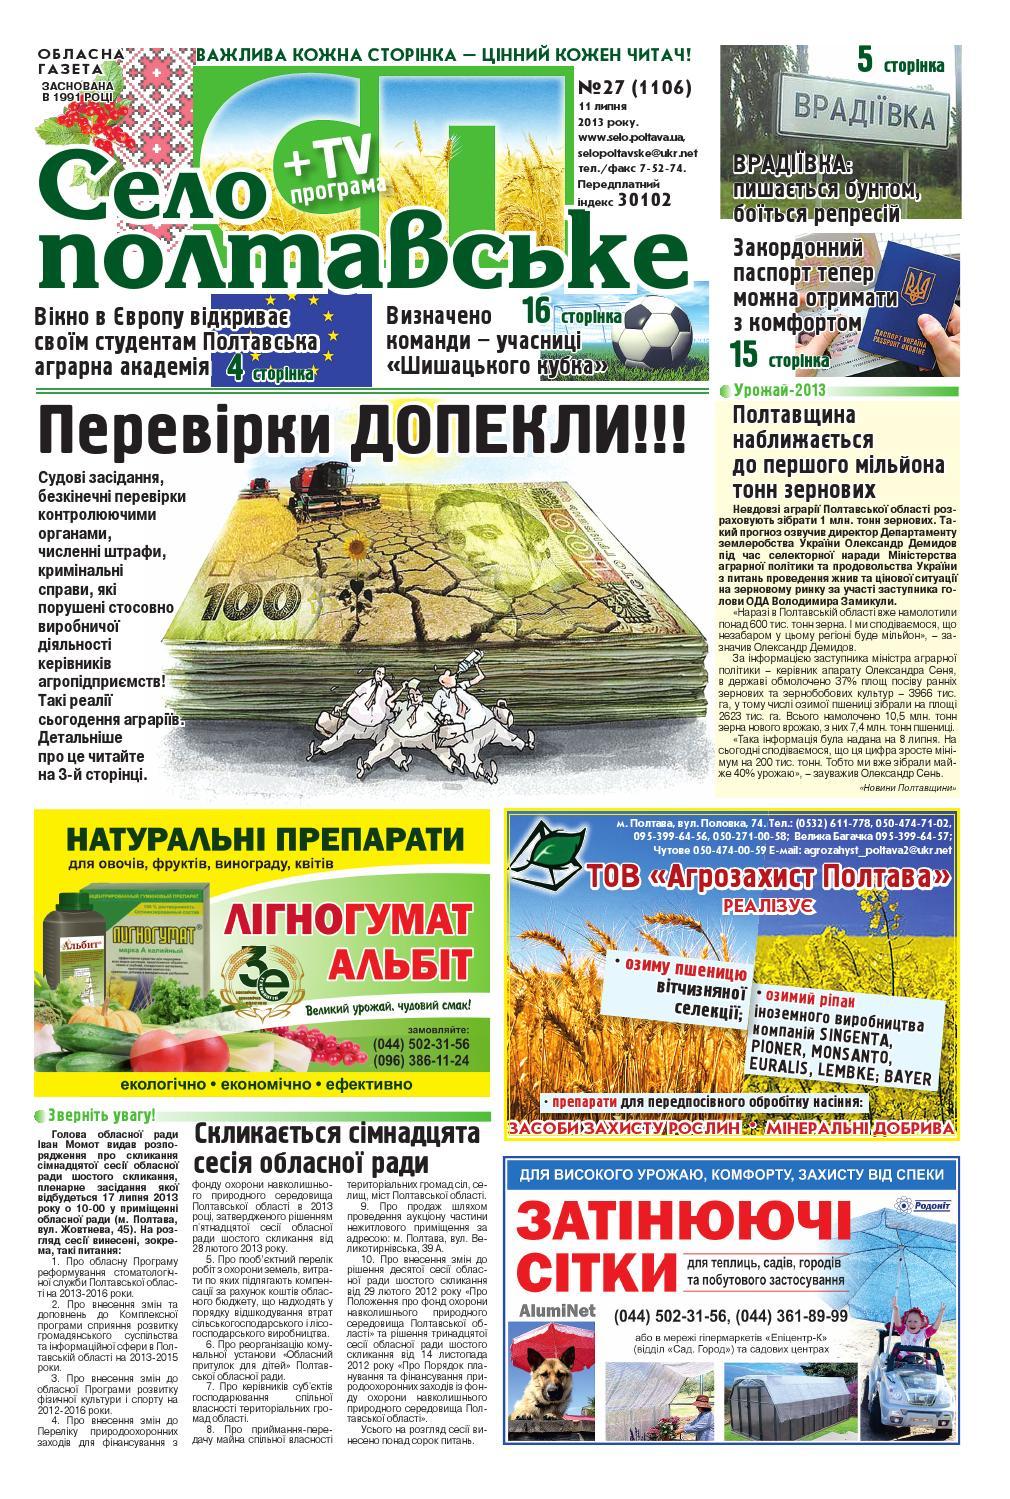 Село полтавське 27-2013 by sasa list - issuu d89f8c37aeb7f